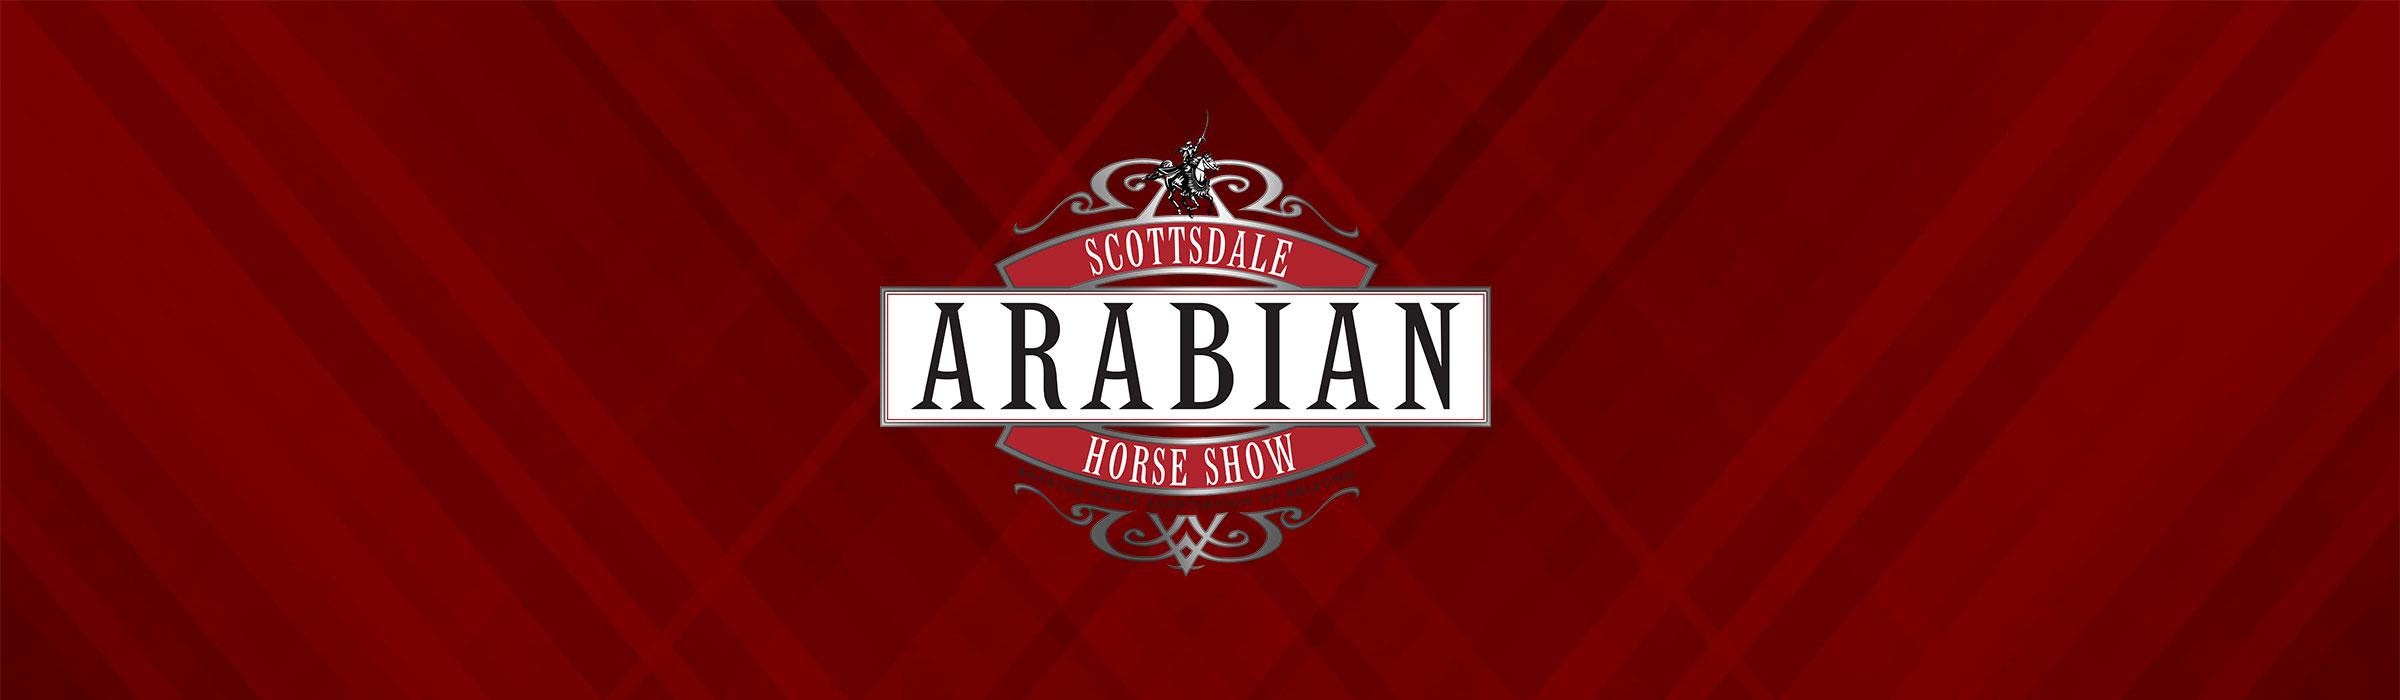 ScottsdaleShow.com